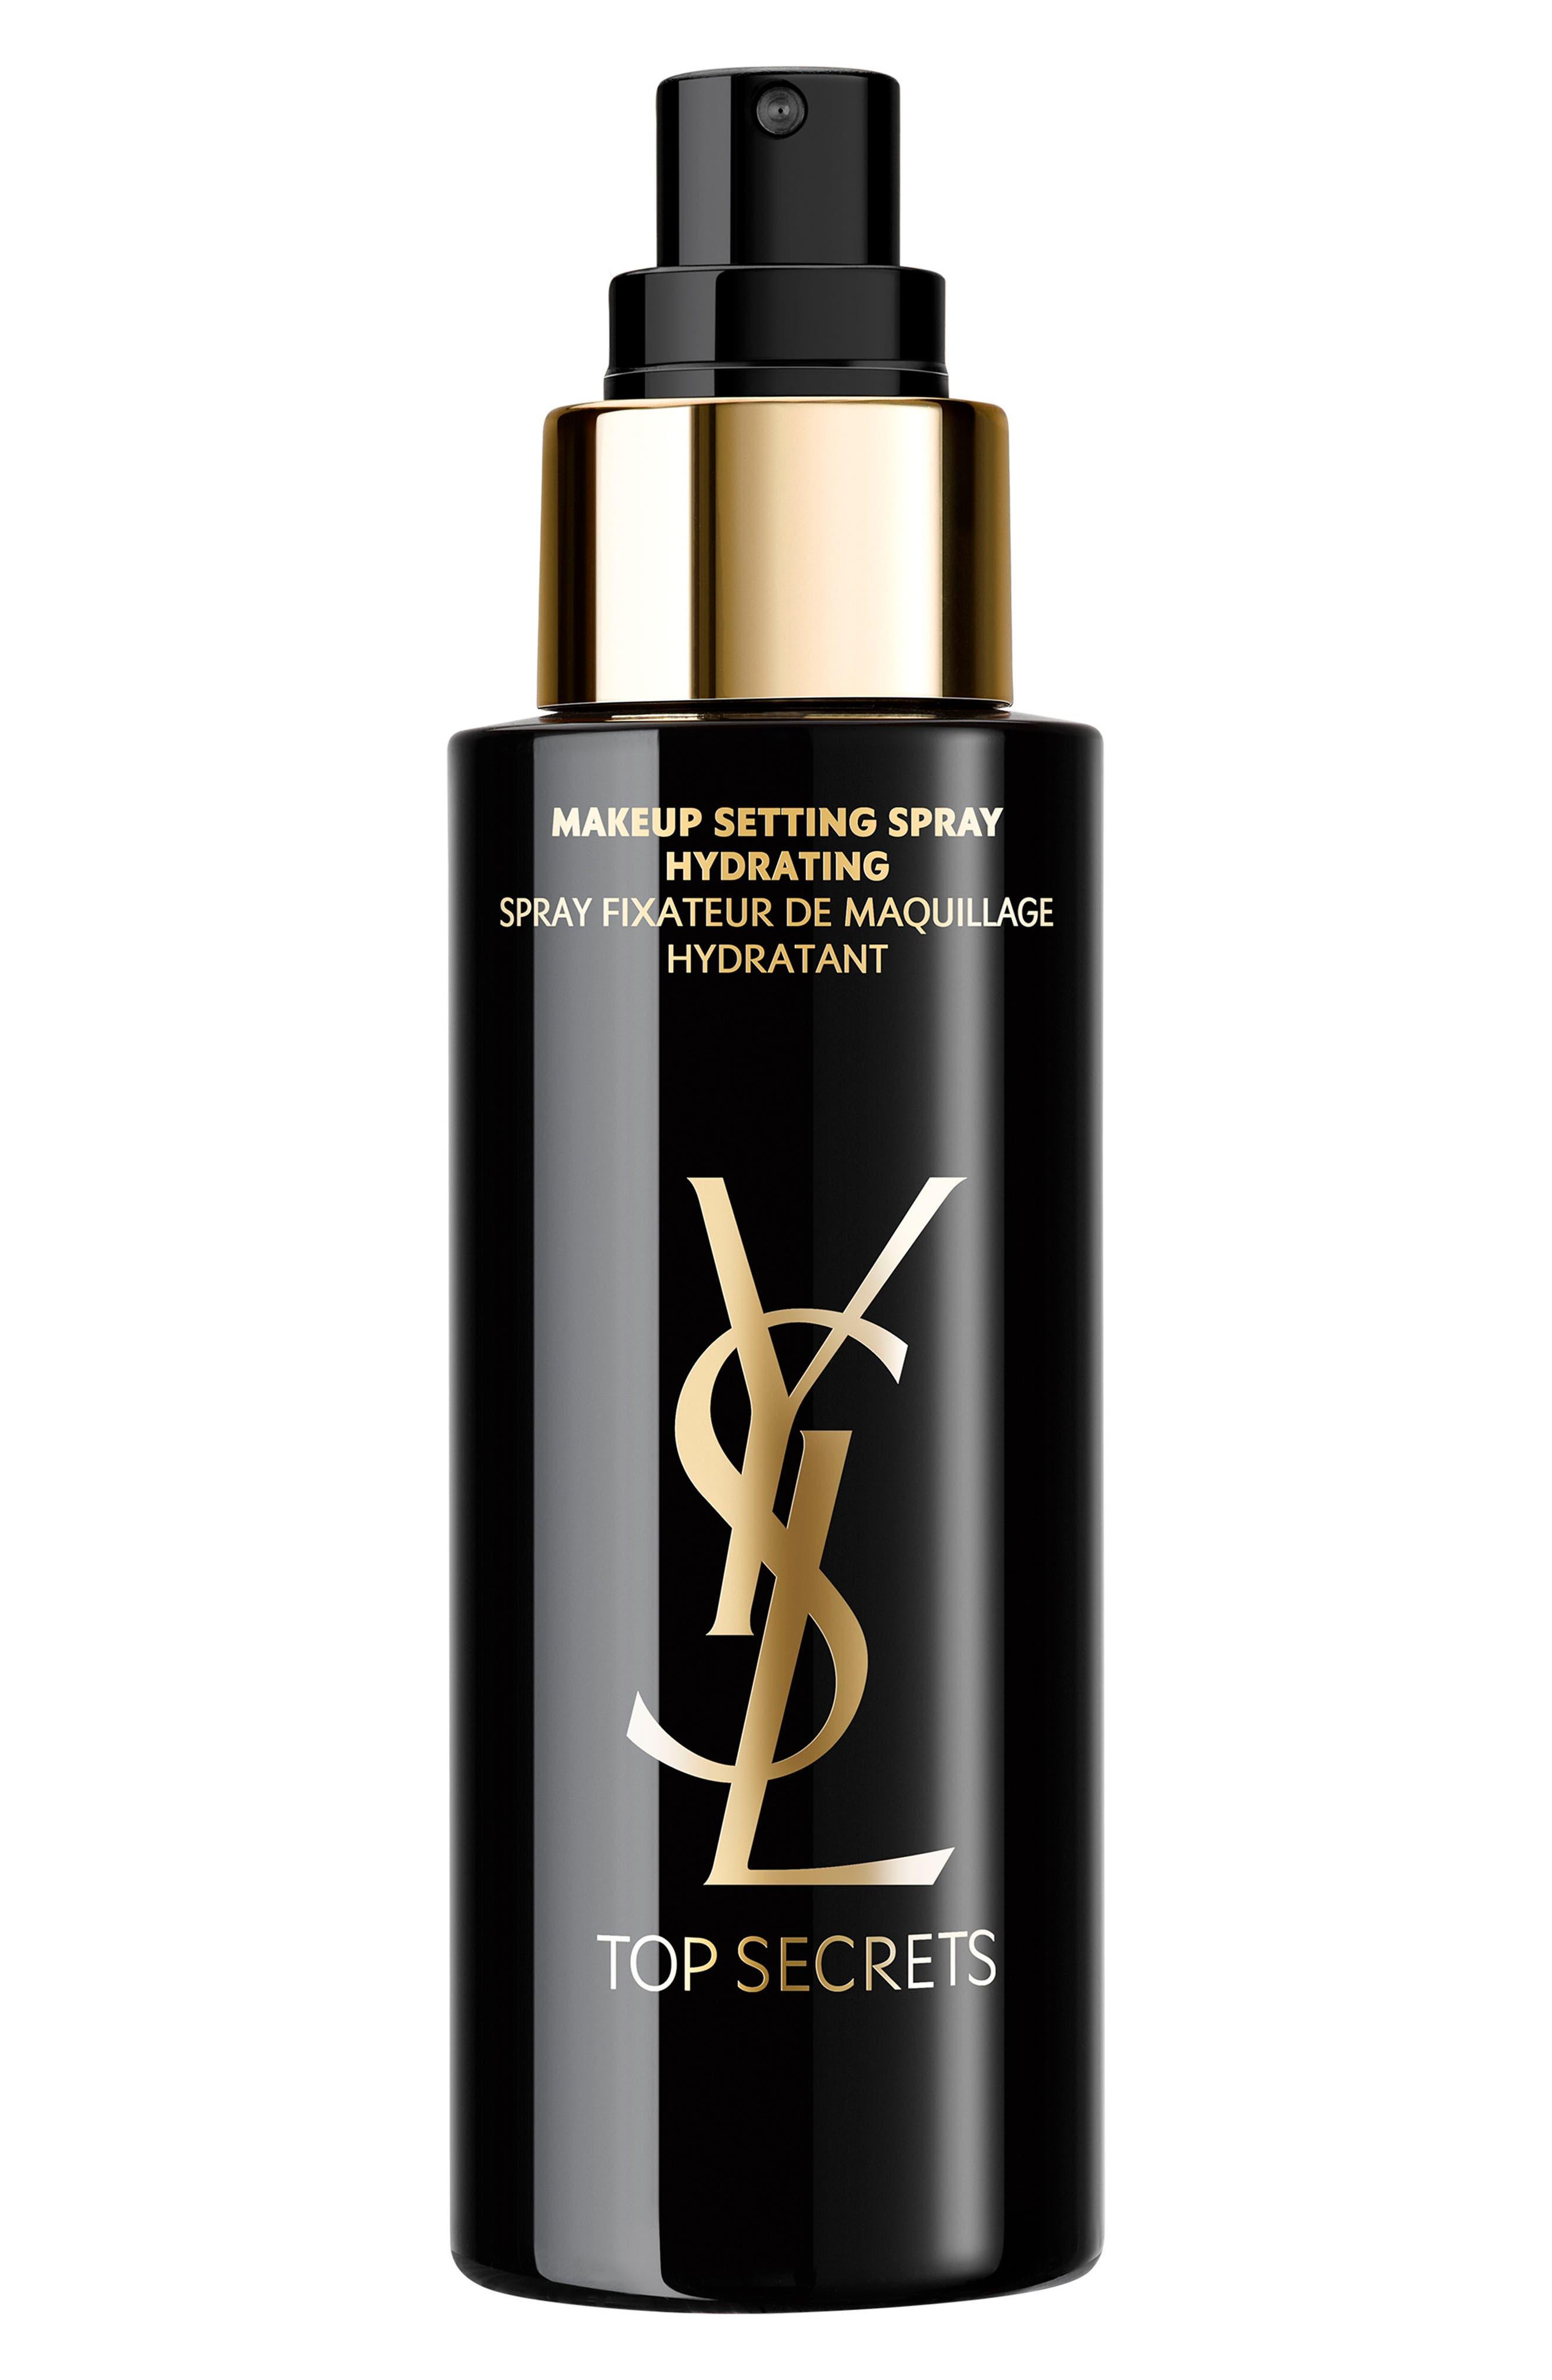 Top Secrets Glow Perfecting Makeup Setting Spray,                         Main,                         color, No Color